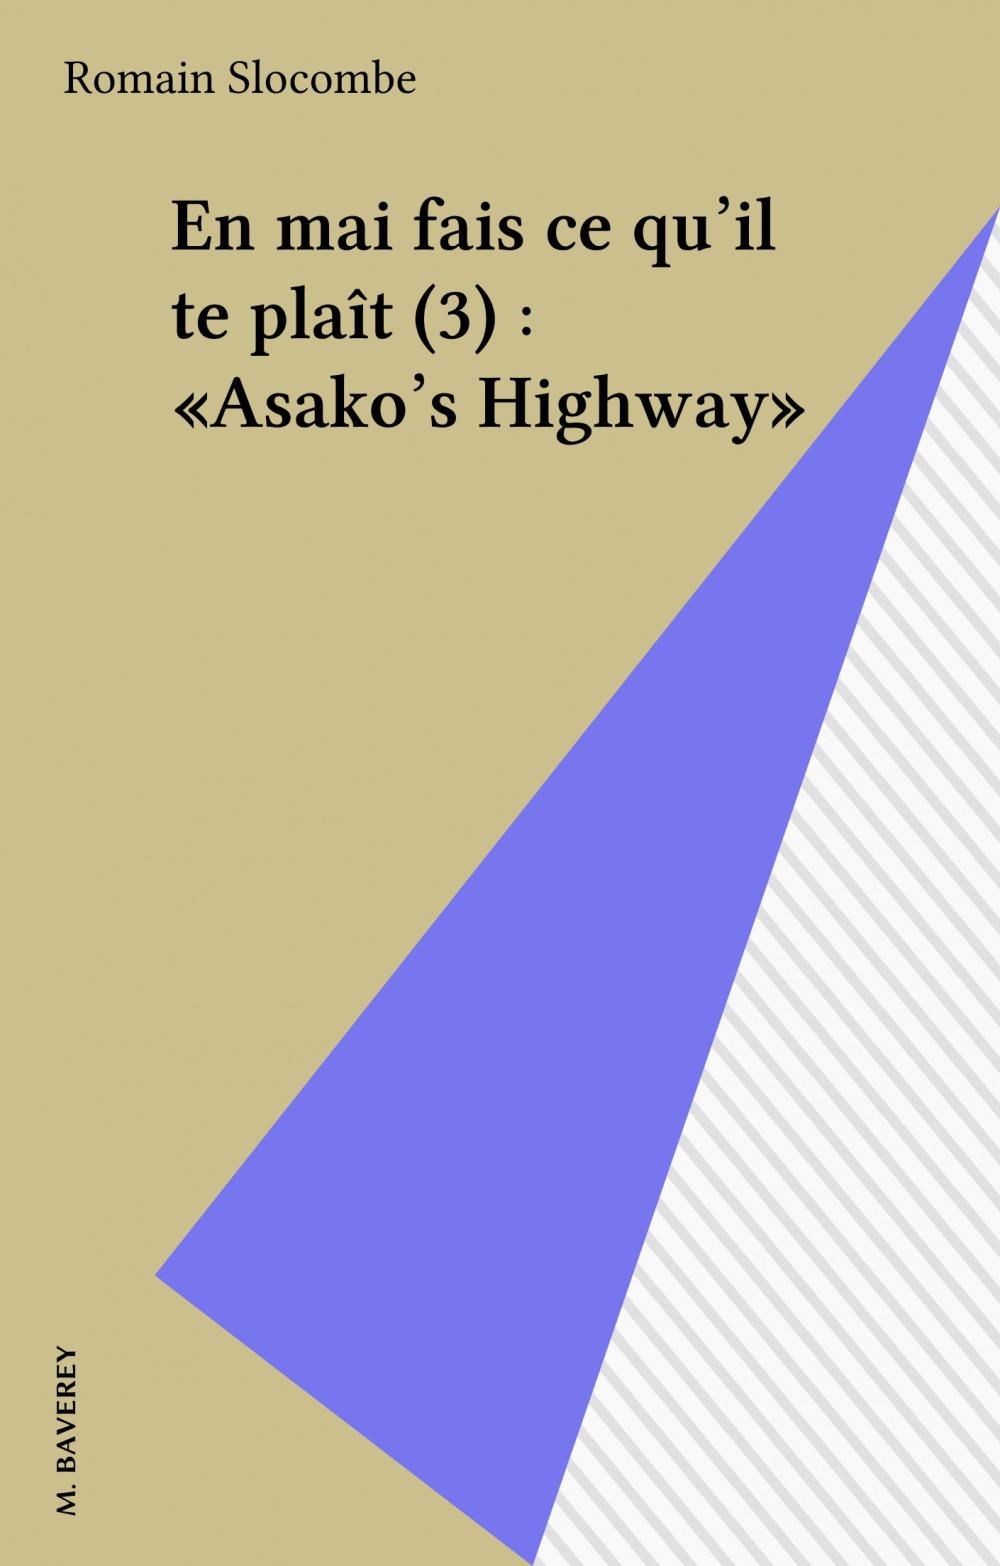 En mai fais ce qu'il te plaît (3) : «Asako's Highway»